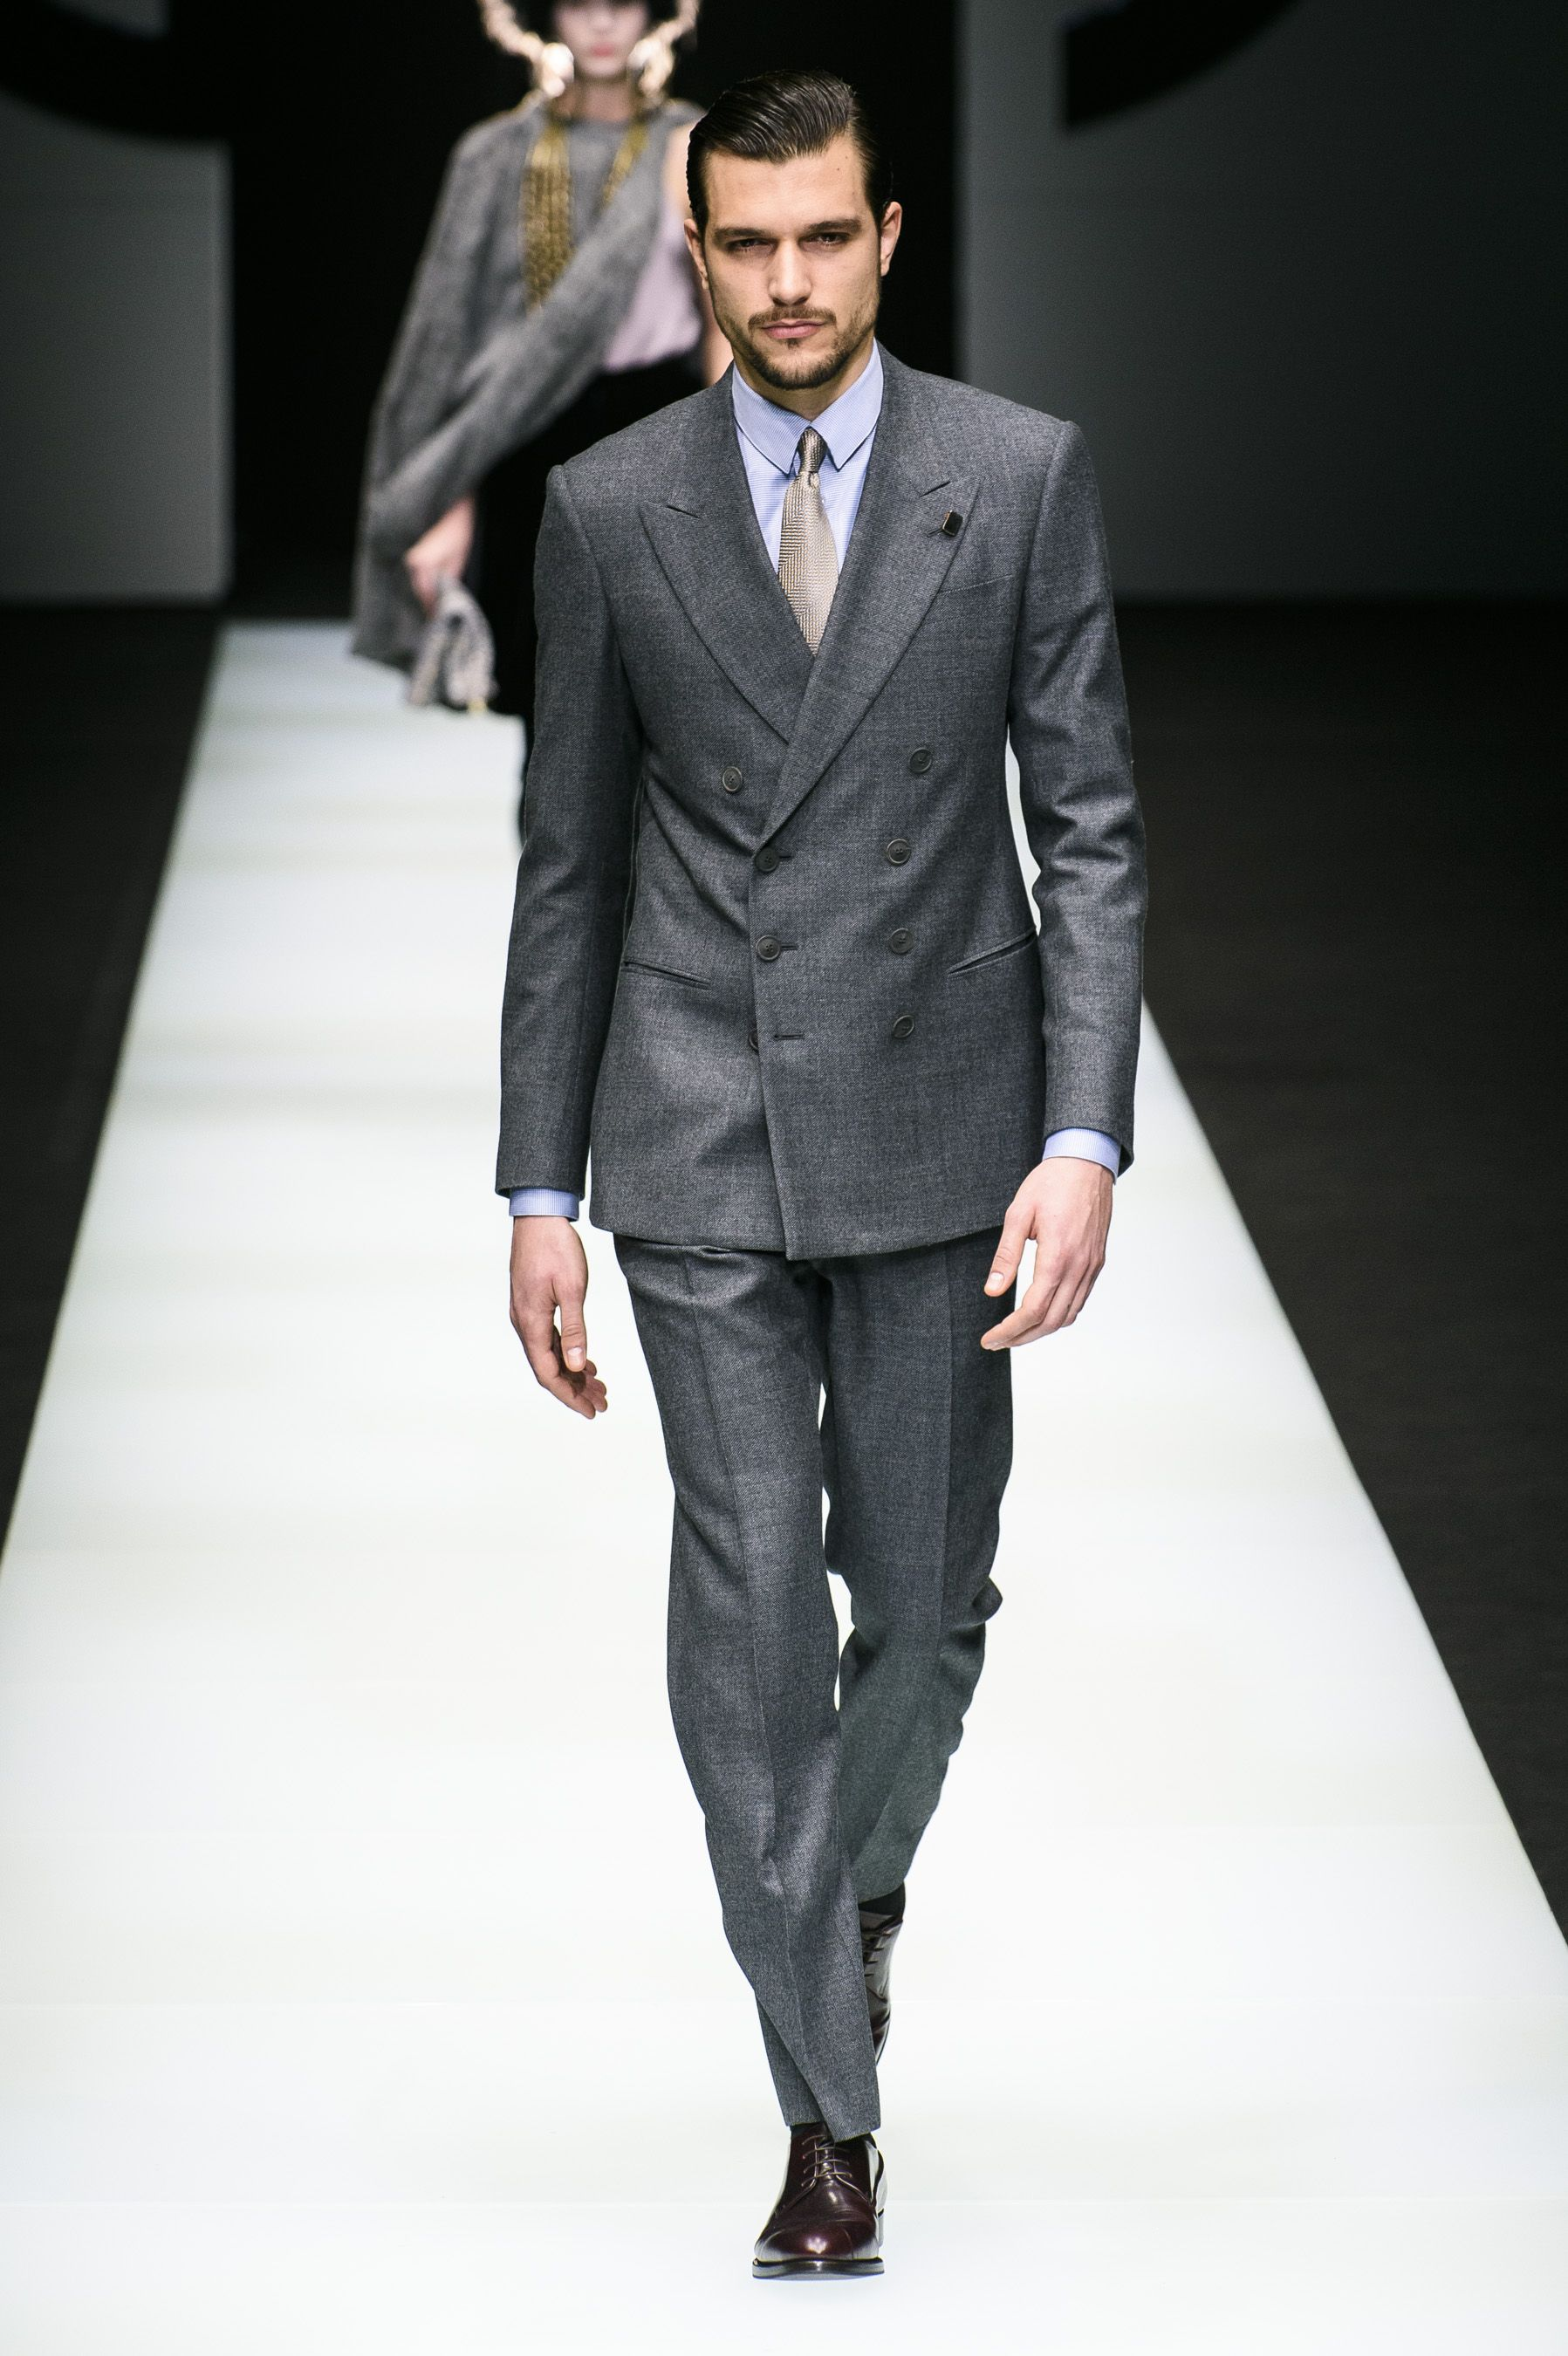 f8c0185a9449 96 Looks From Giorgio Armani Fall 2018 MYFW Show – Giorgio Armani Runway at  Milan Fashion Week